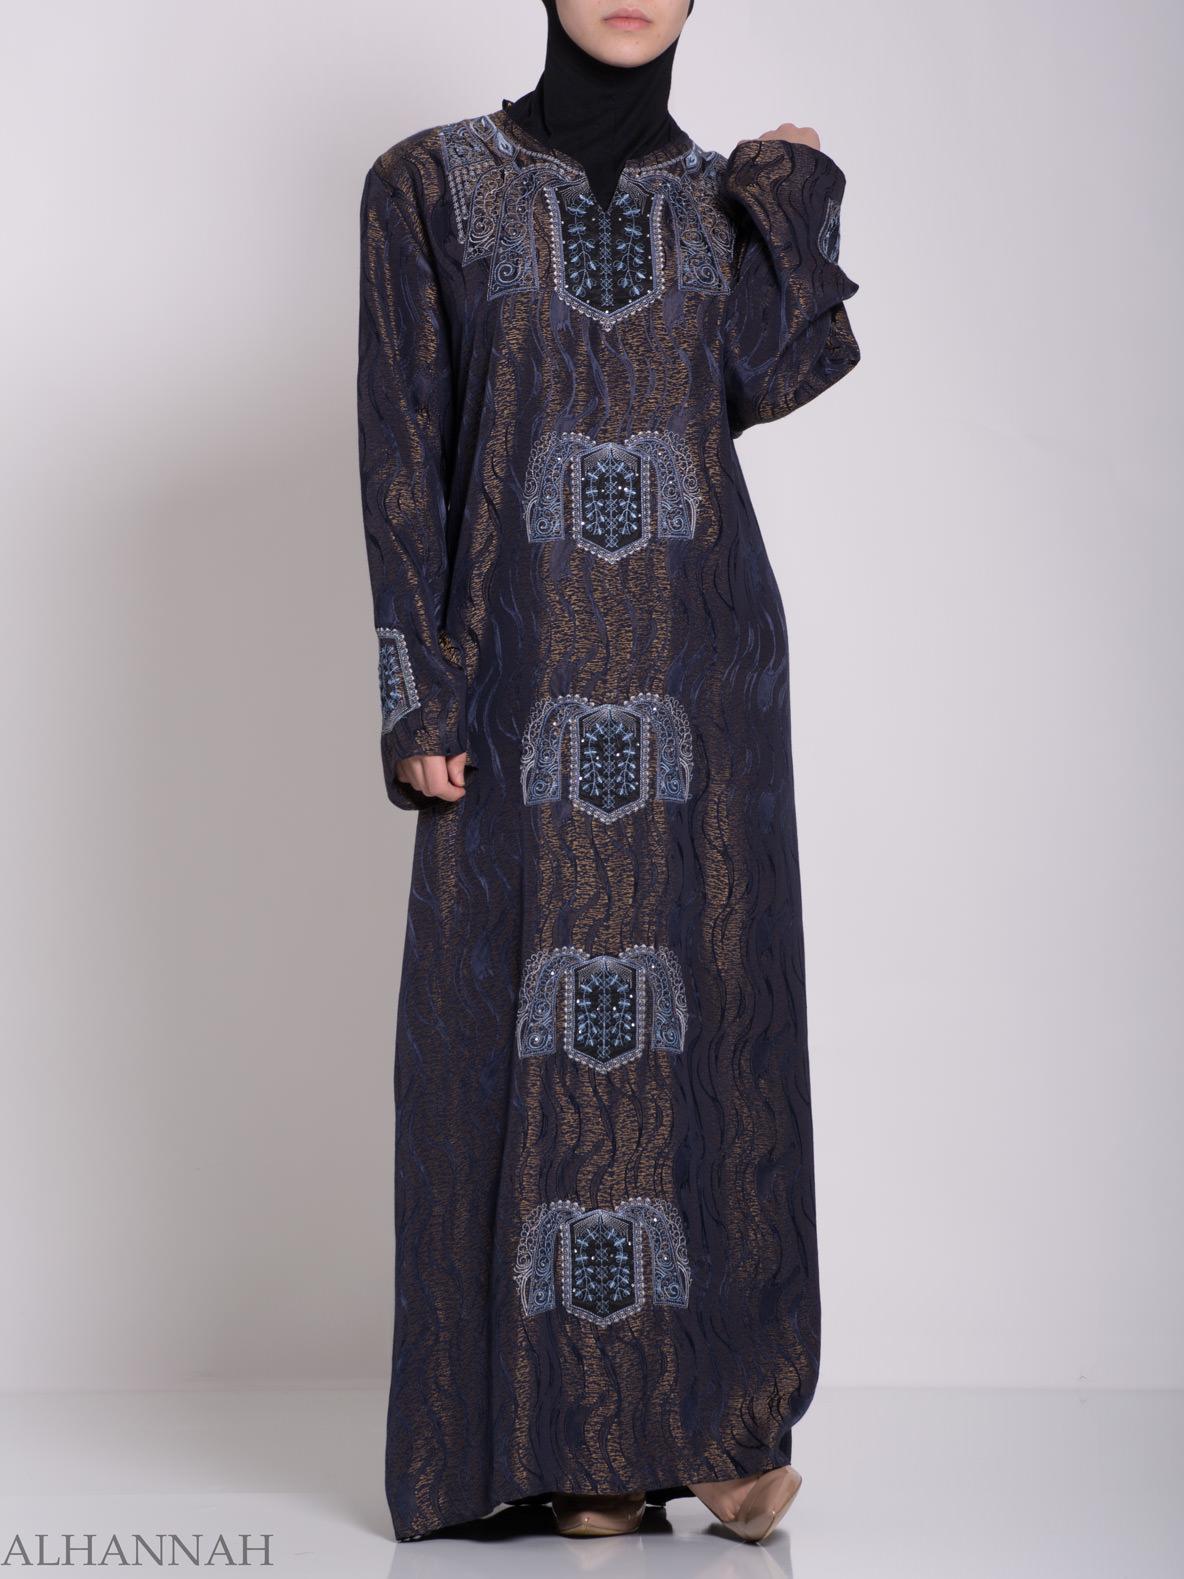 Embroidered Glowing Swirled Jordanian Abaya ab705 (5)